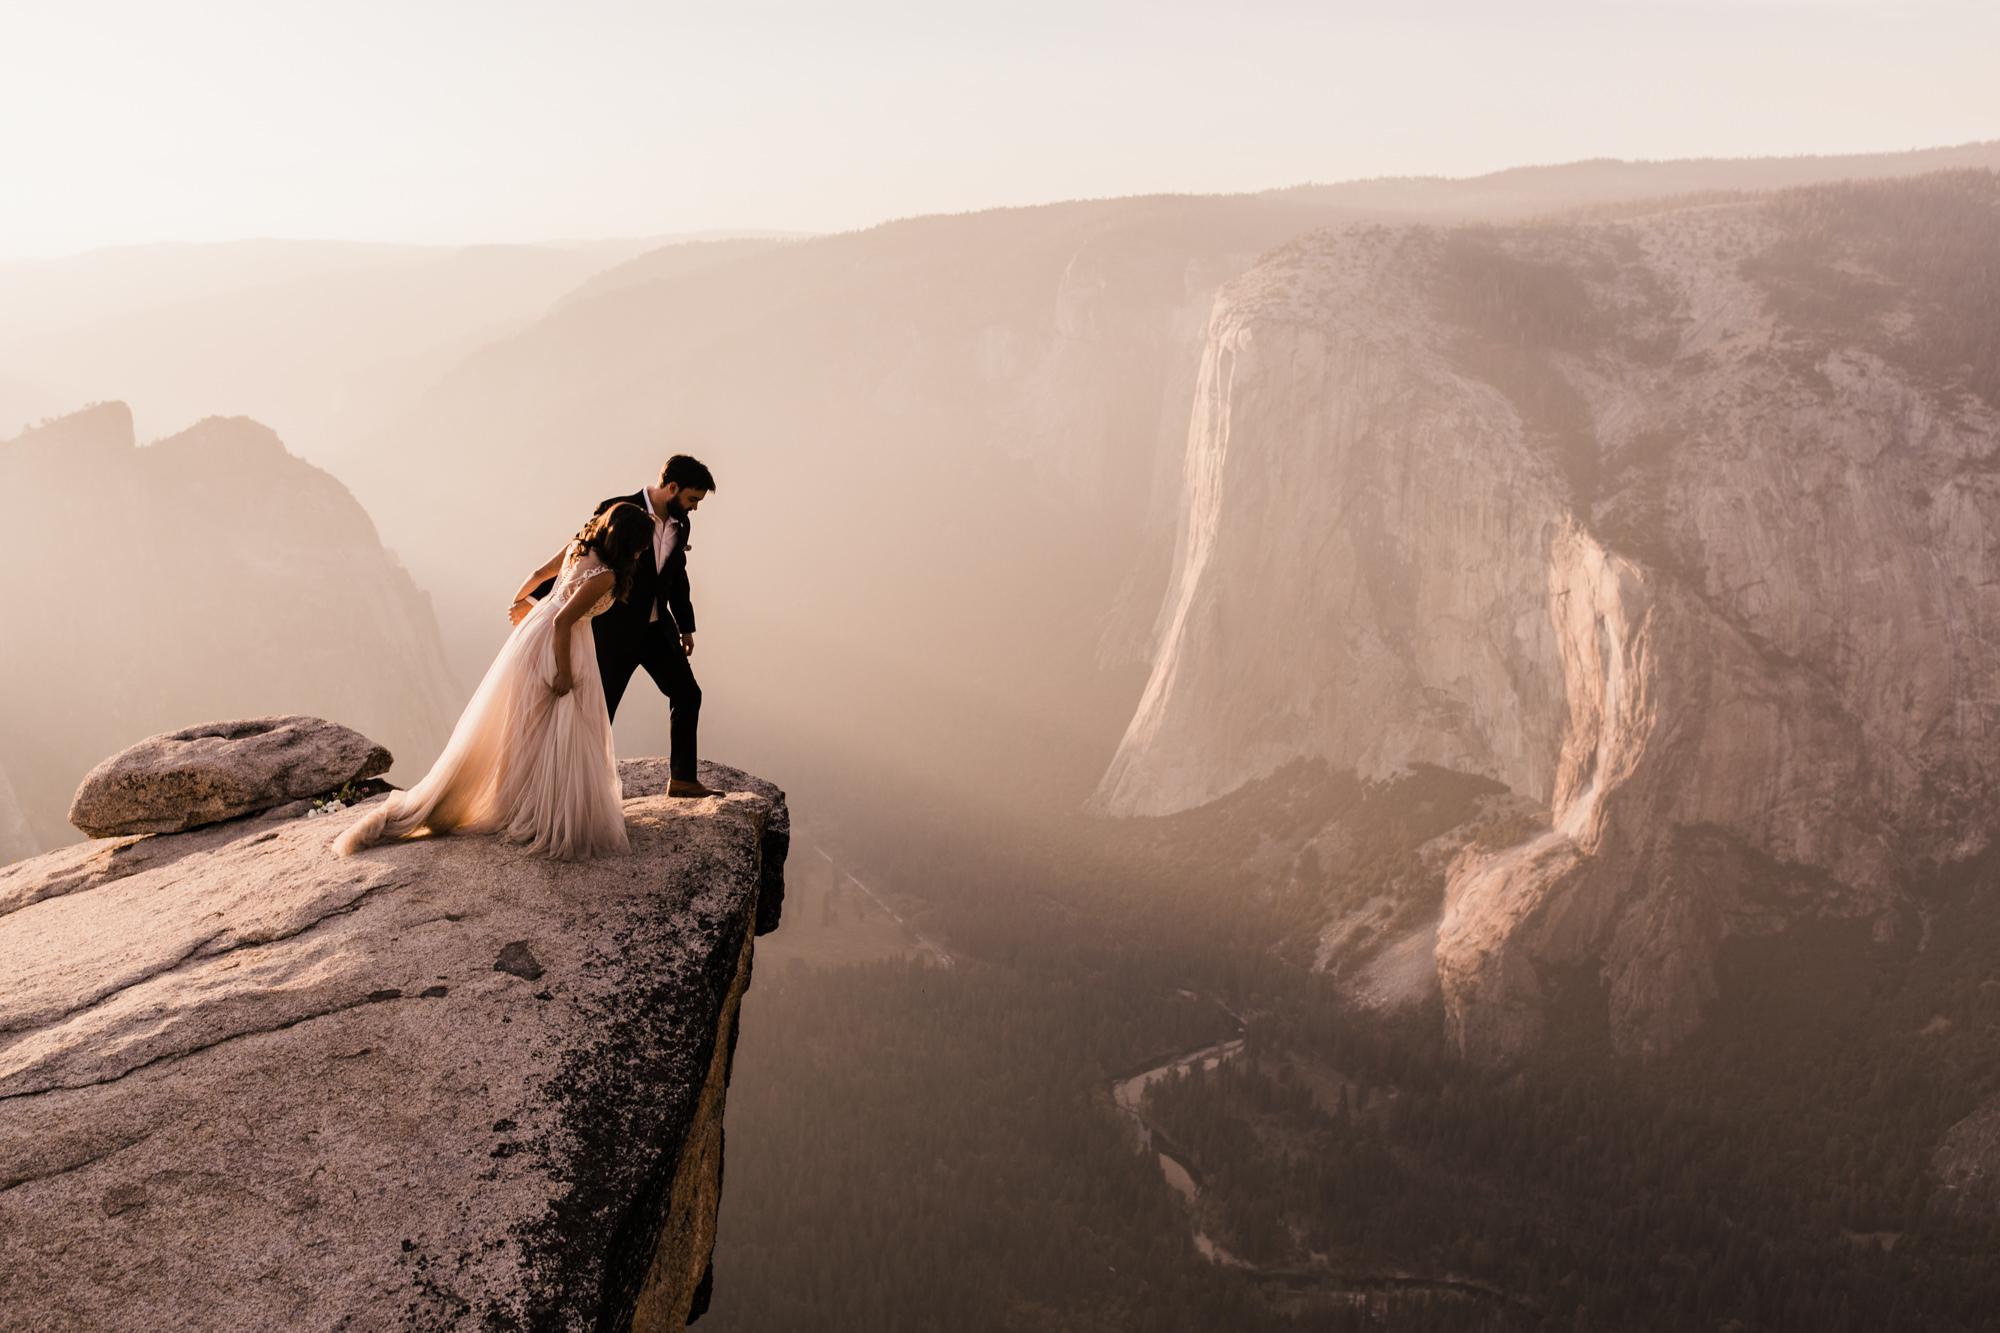 yosemite national park intimate elopement | destination adventure wedding photographers | the hearnes adventure photography | www.thehearnes.com